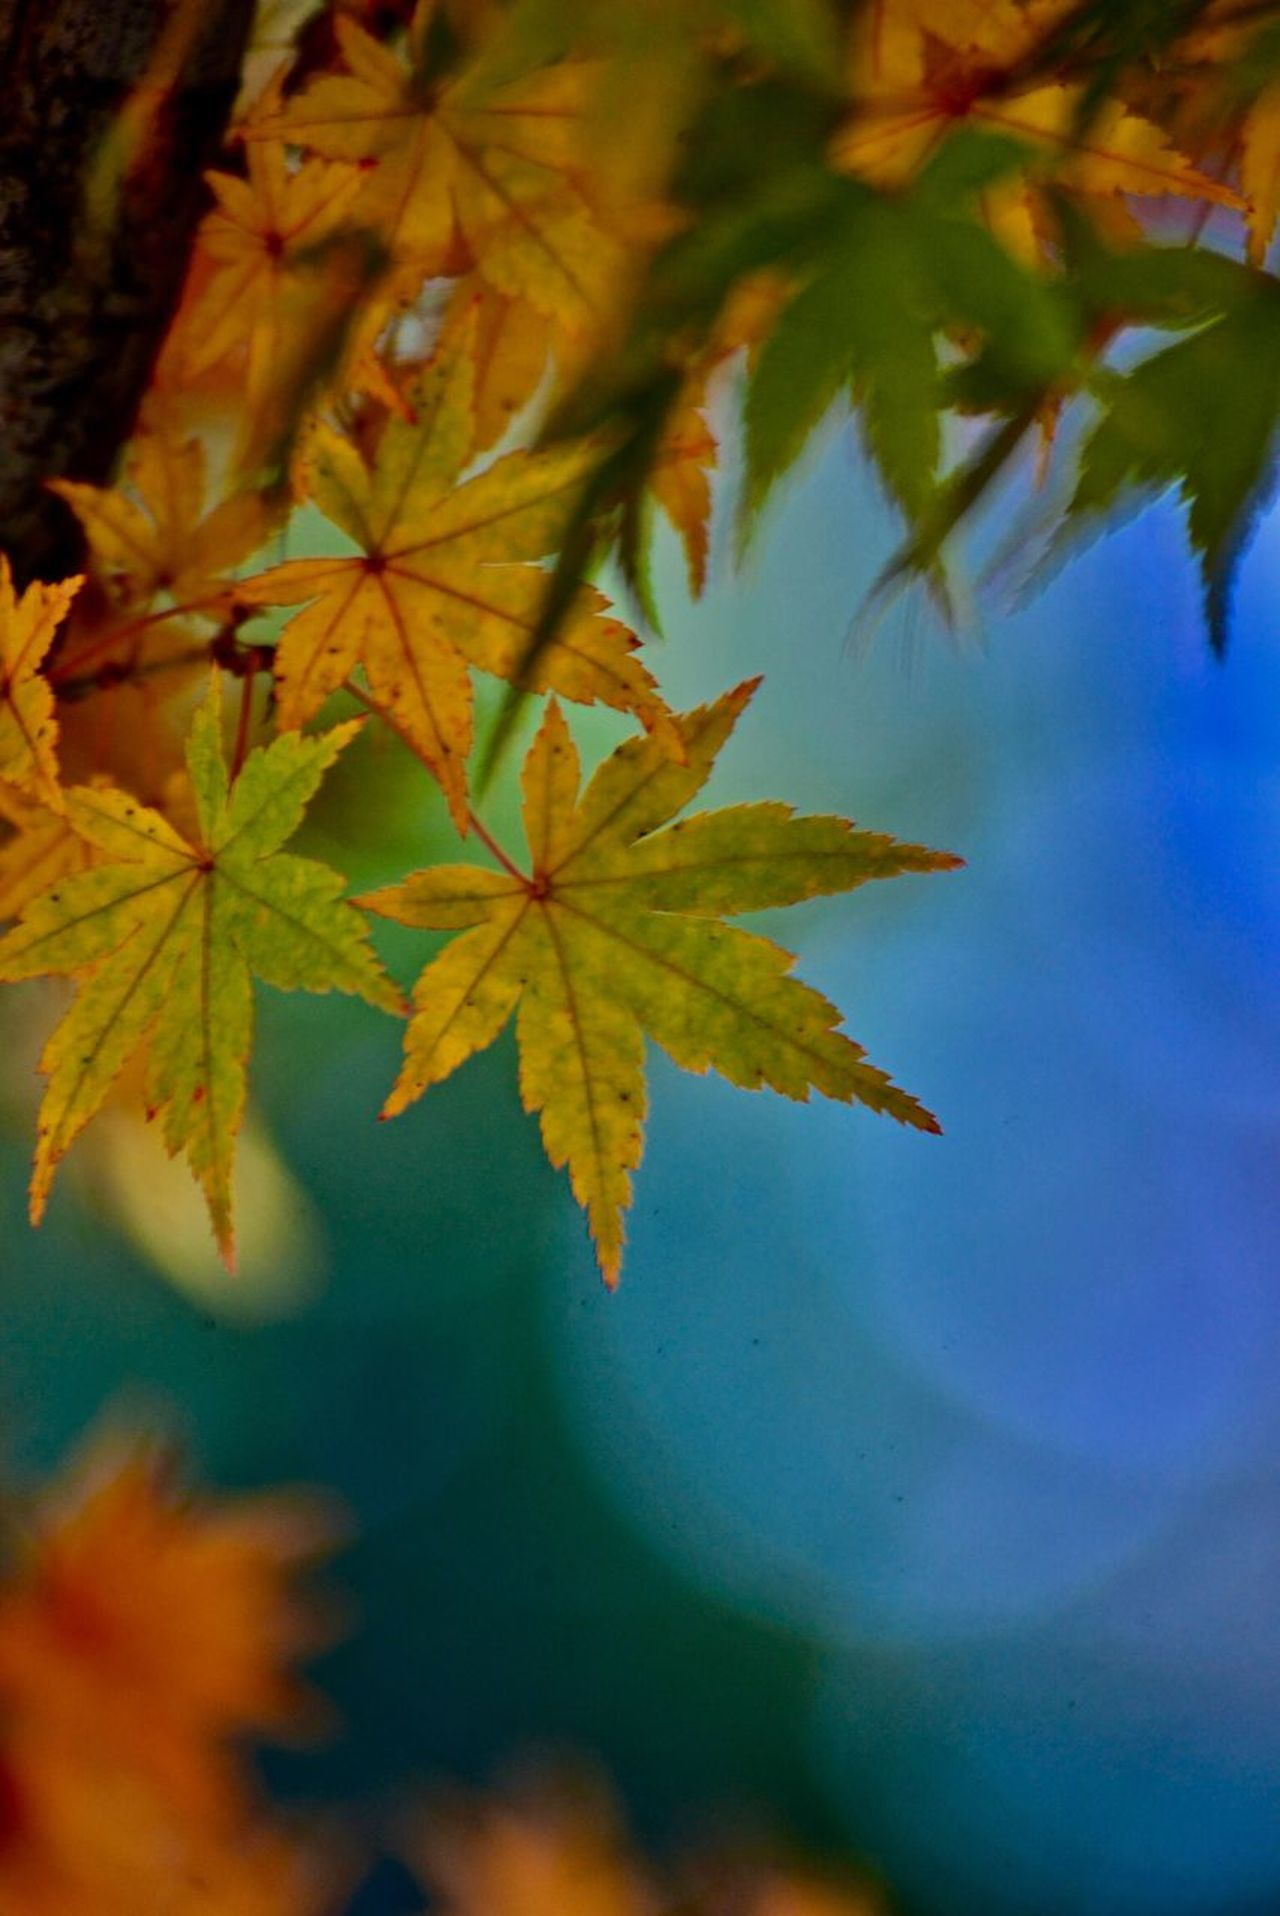 Design Maple Autumn Colors Nature Light Leaves Maple Leaf Leaf Pastel パステルカラー🍁 ✨